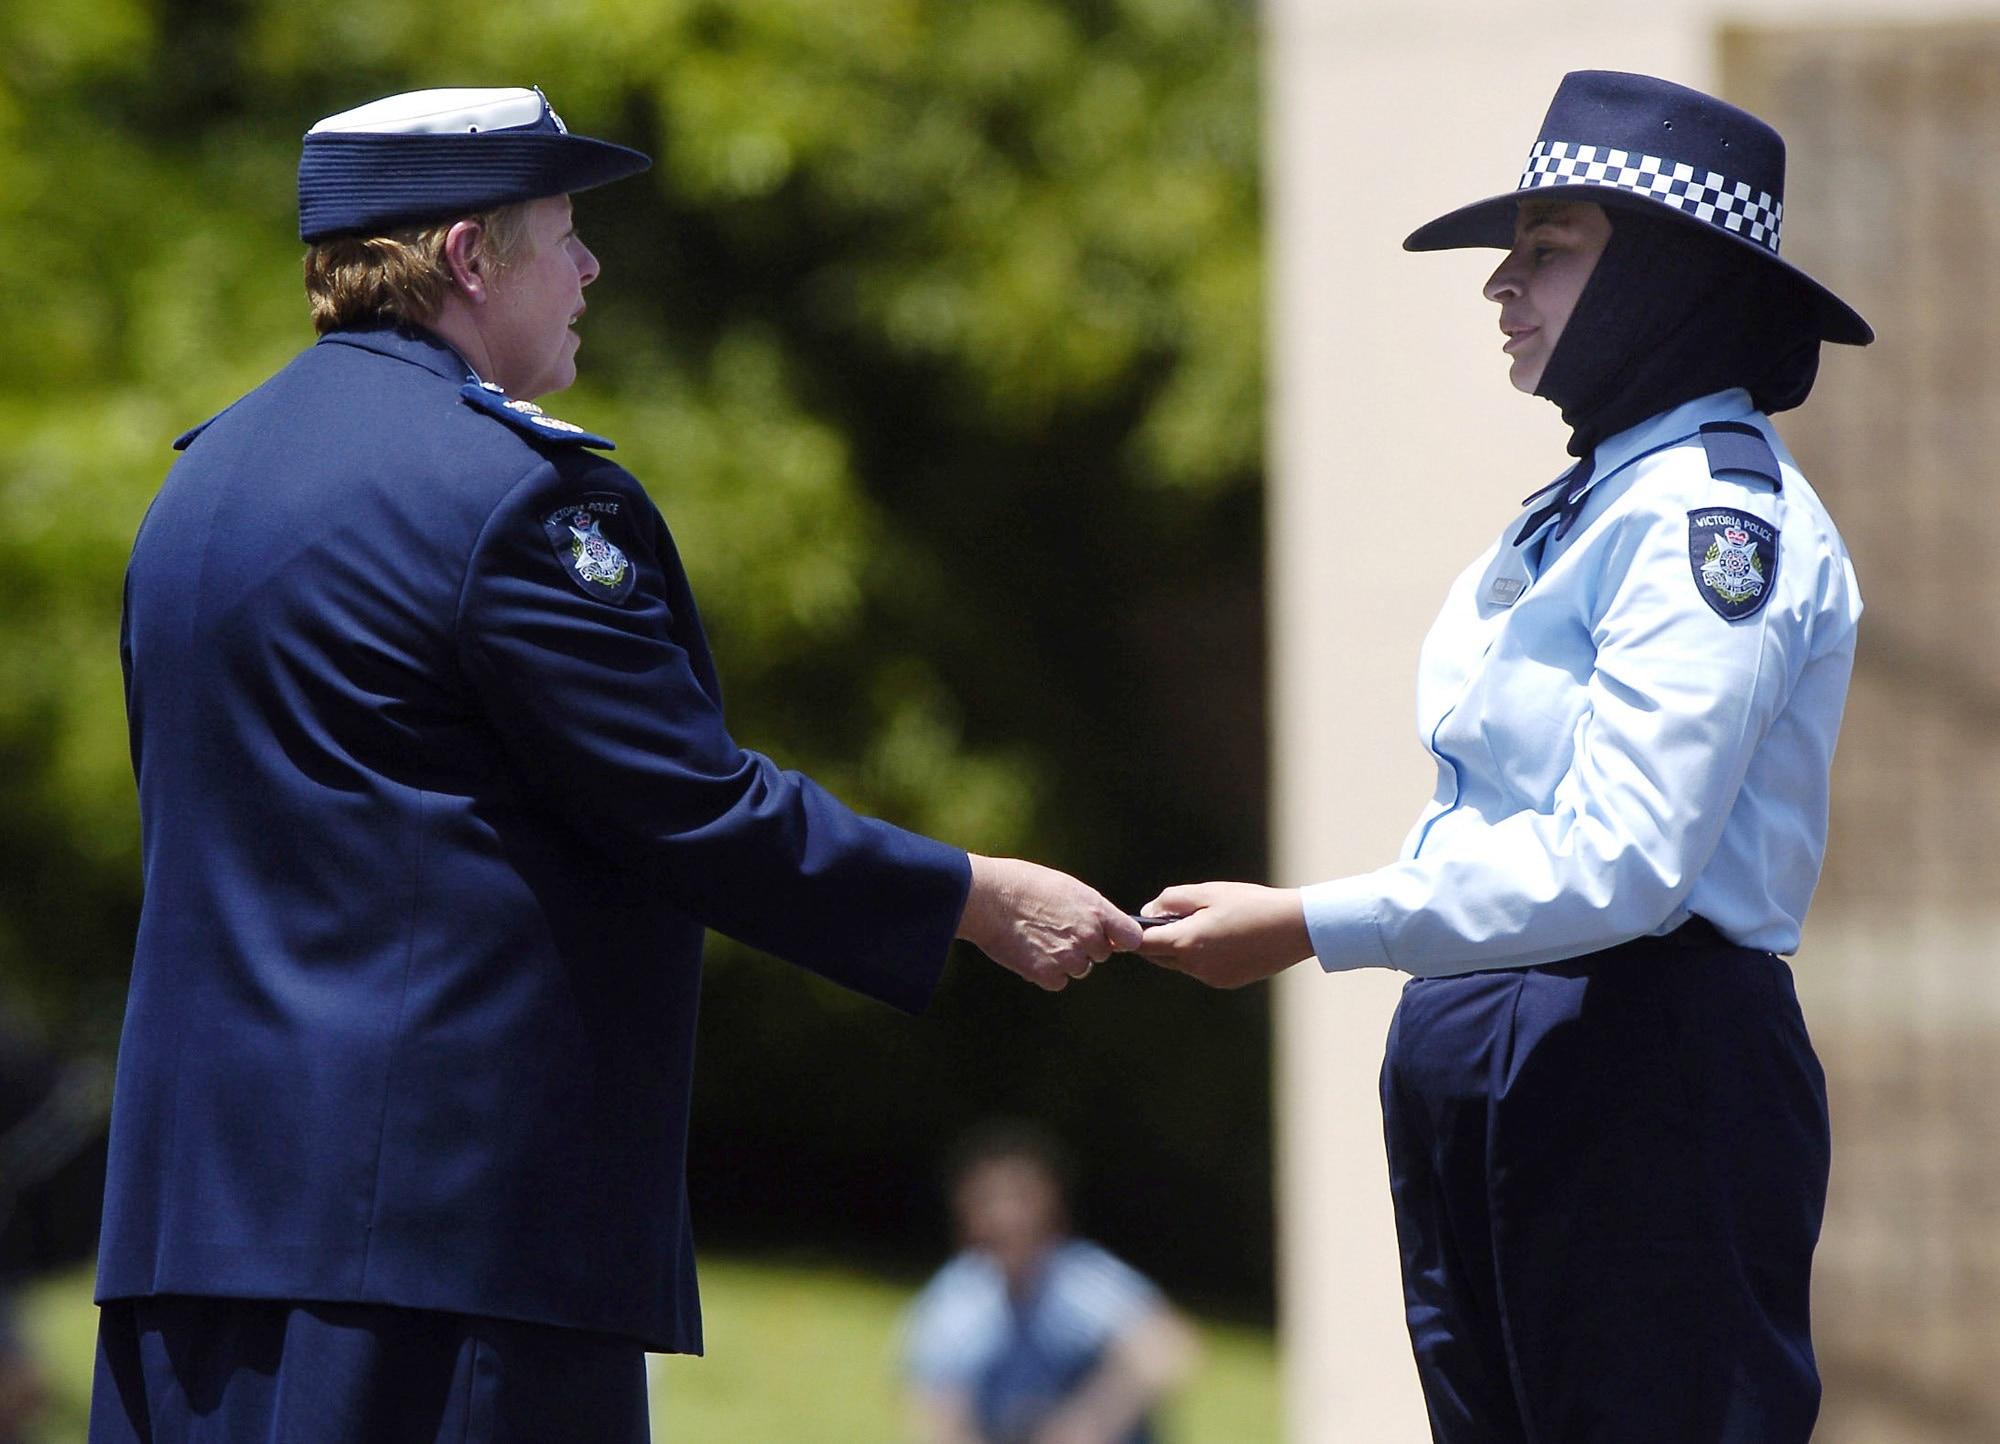 2004 - Police recruit Maha Sukkar receives her badge from Police Commissioner Christine Nixon